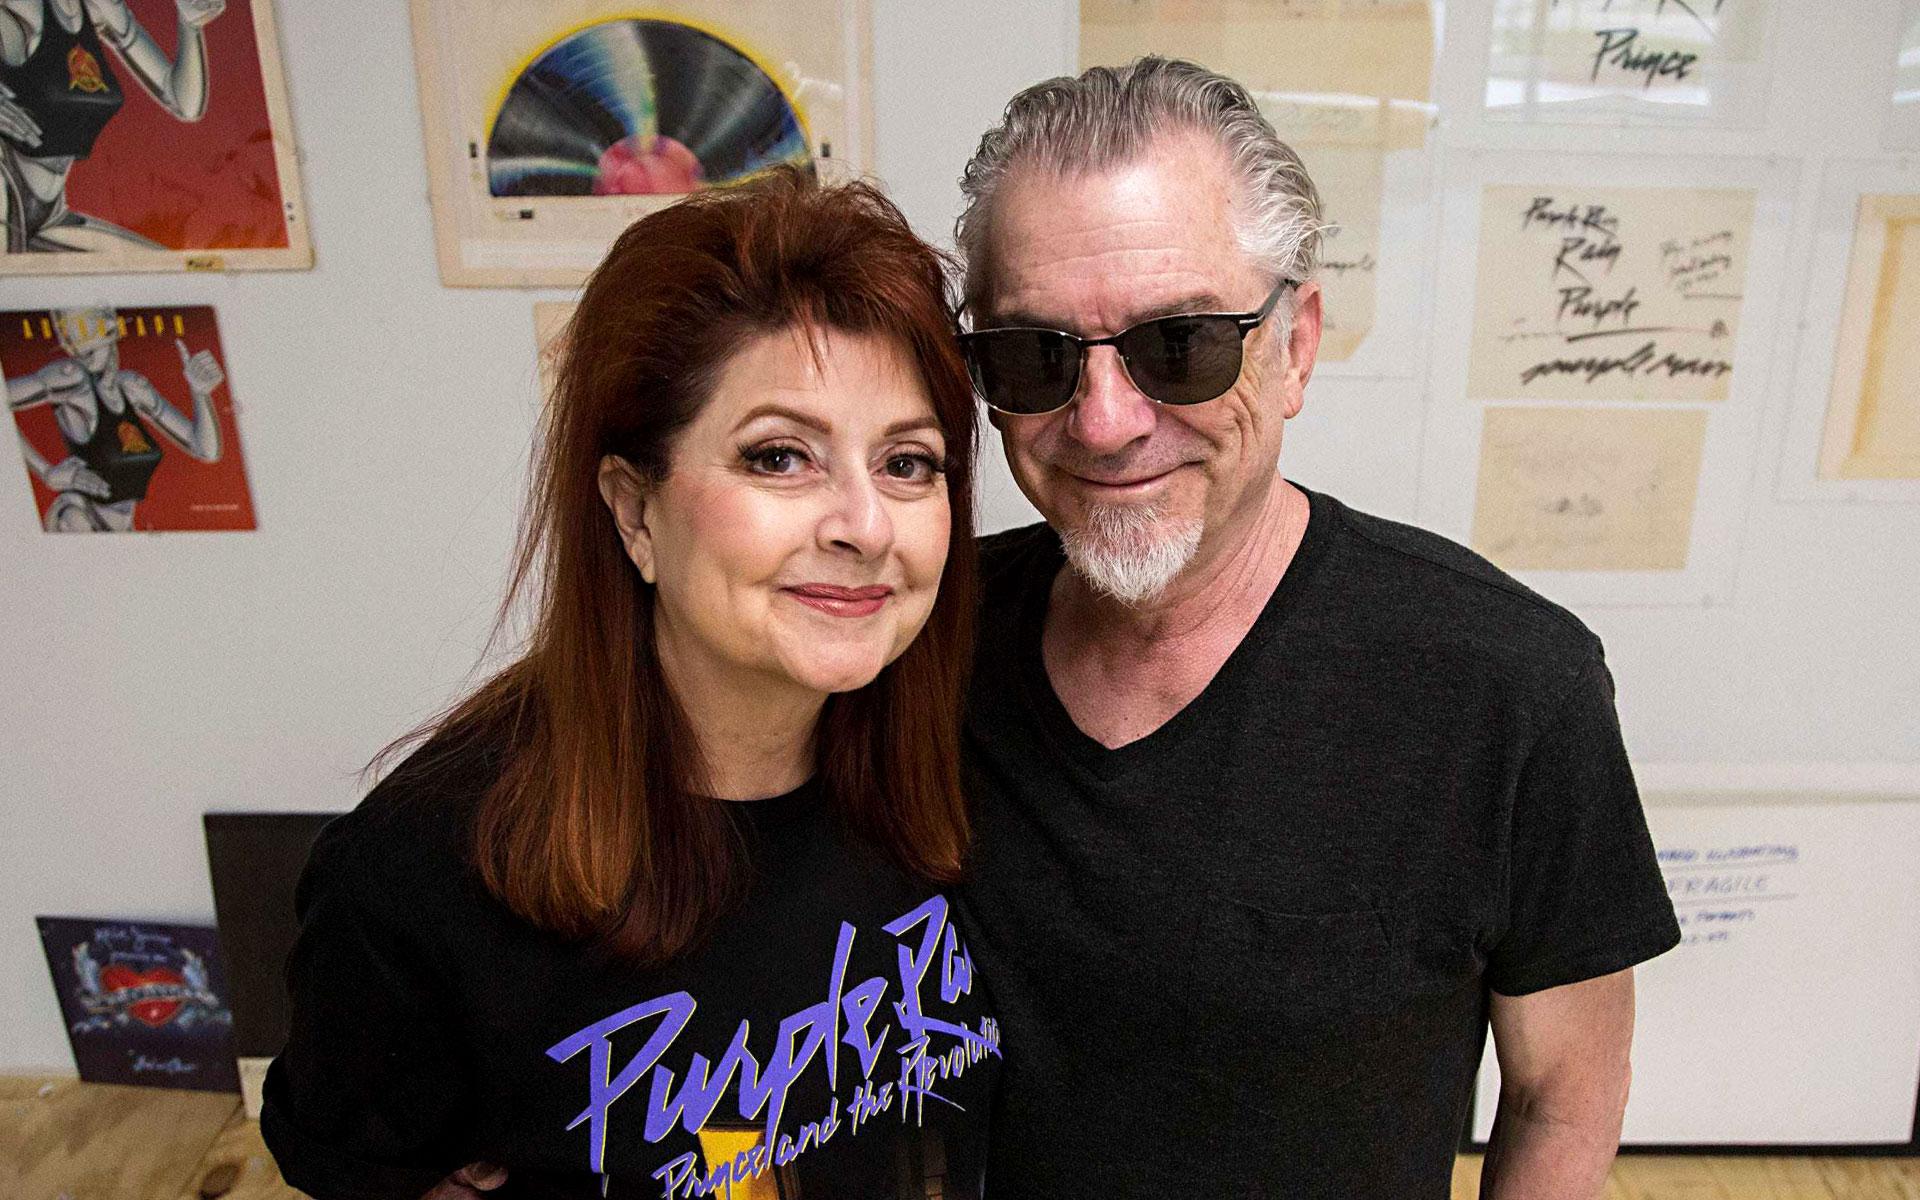 Margo Nahas and Jay Vigon on Making Album Covers for Prince, Van Halen, Stevie Wonder, Fleetwood Mac